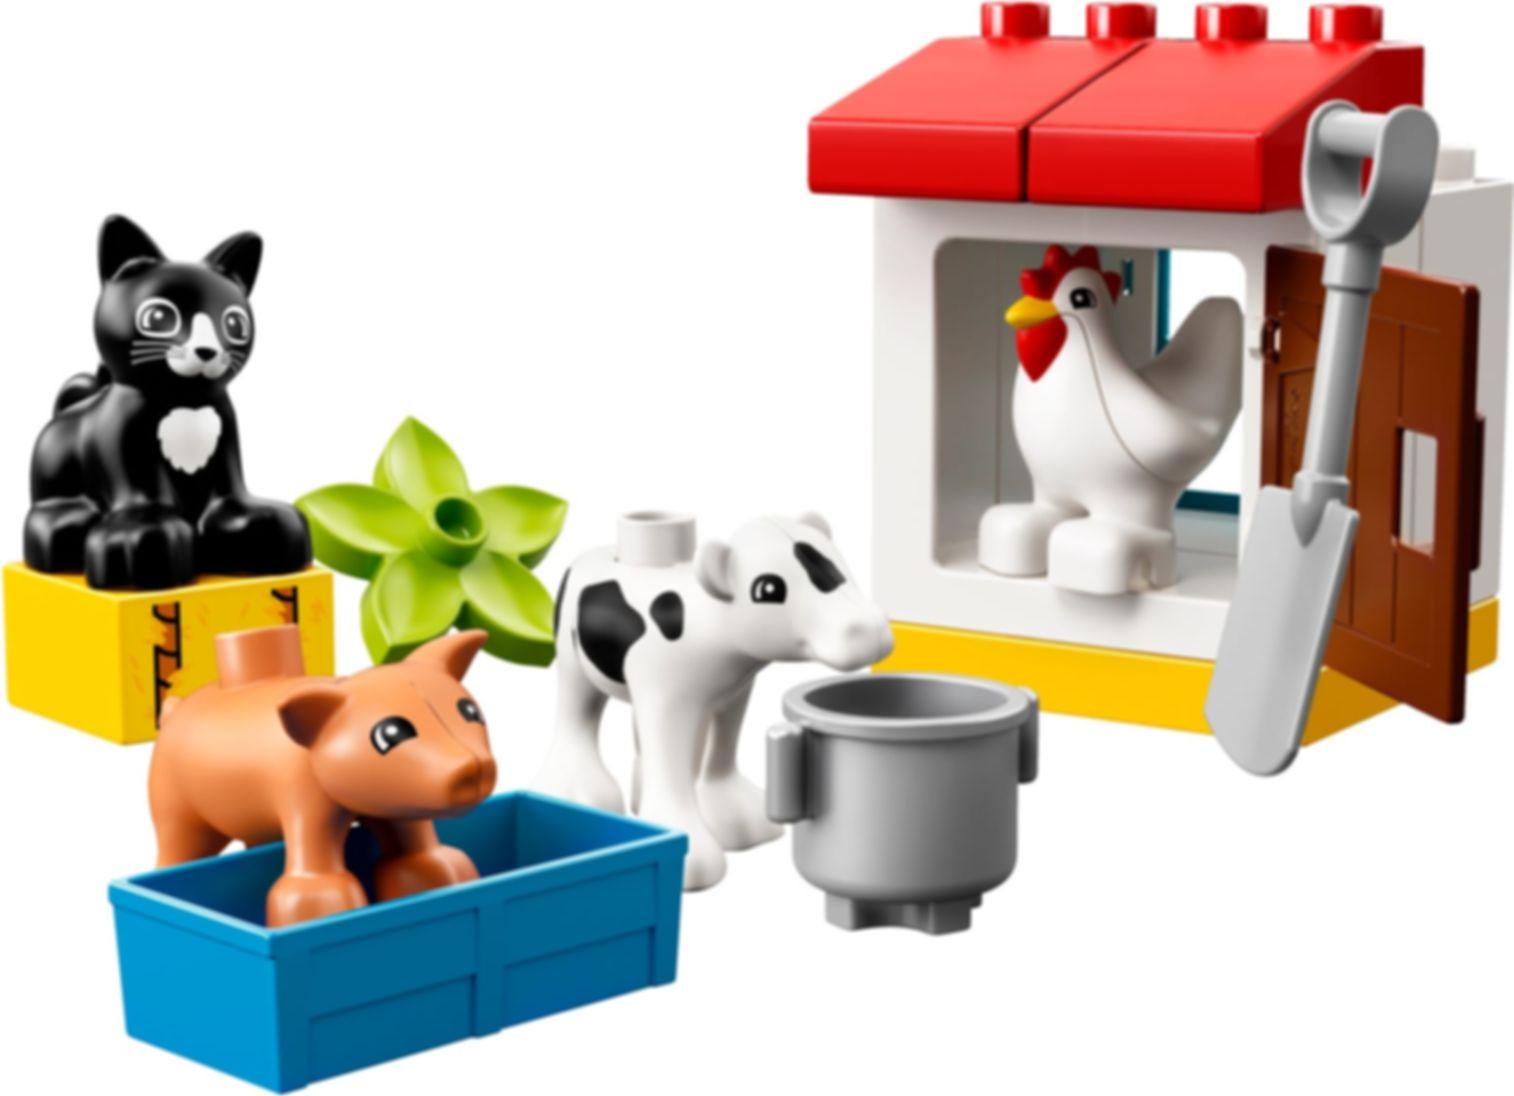 LEGO® DUPLO® Farm Animals components